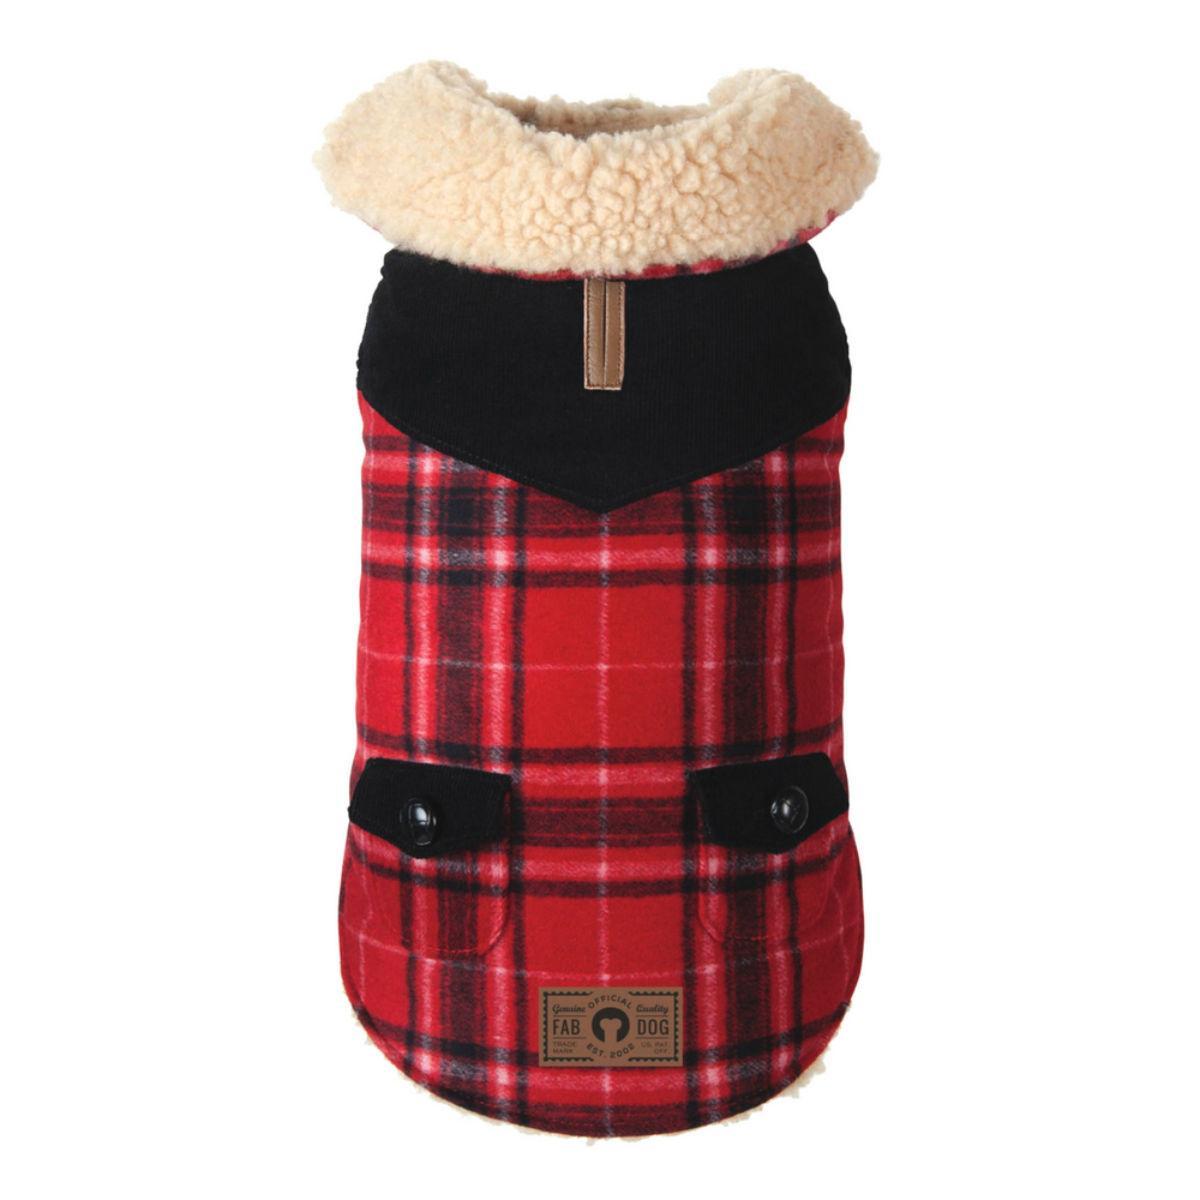 Wool Plaid Shearling Dog Jacket - Red